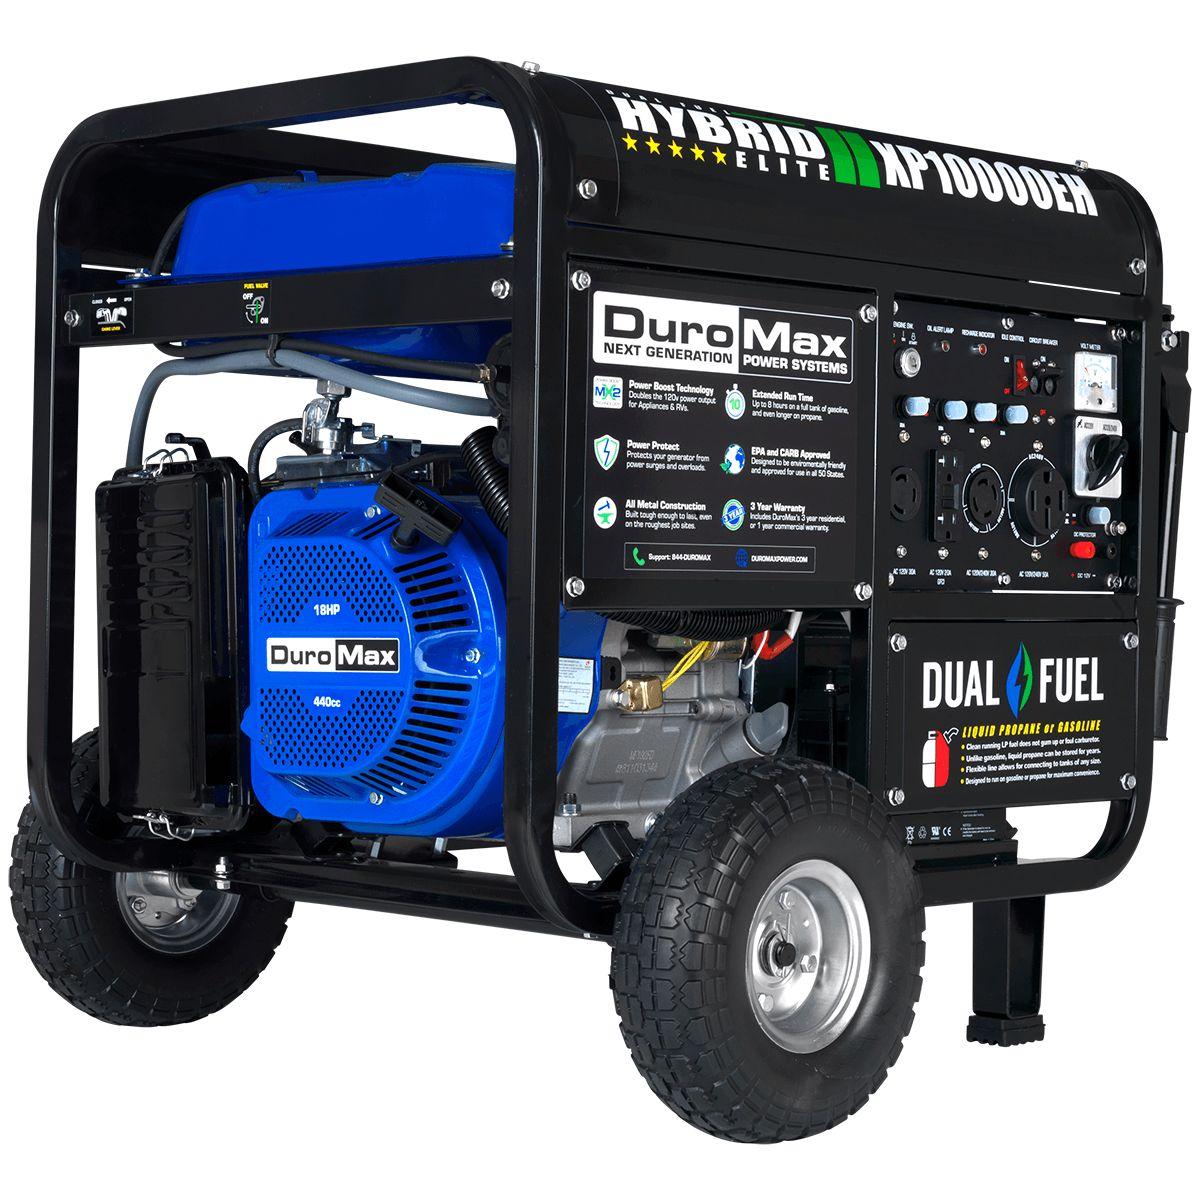 Duromax Xp10000eh 10 000 Watt Electric Start Dual Fuel Hybrid Portable Generator Ebay